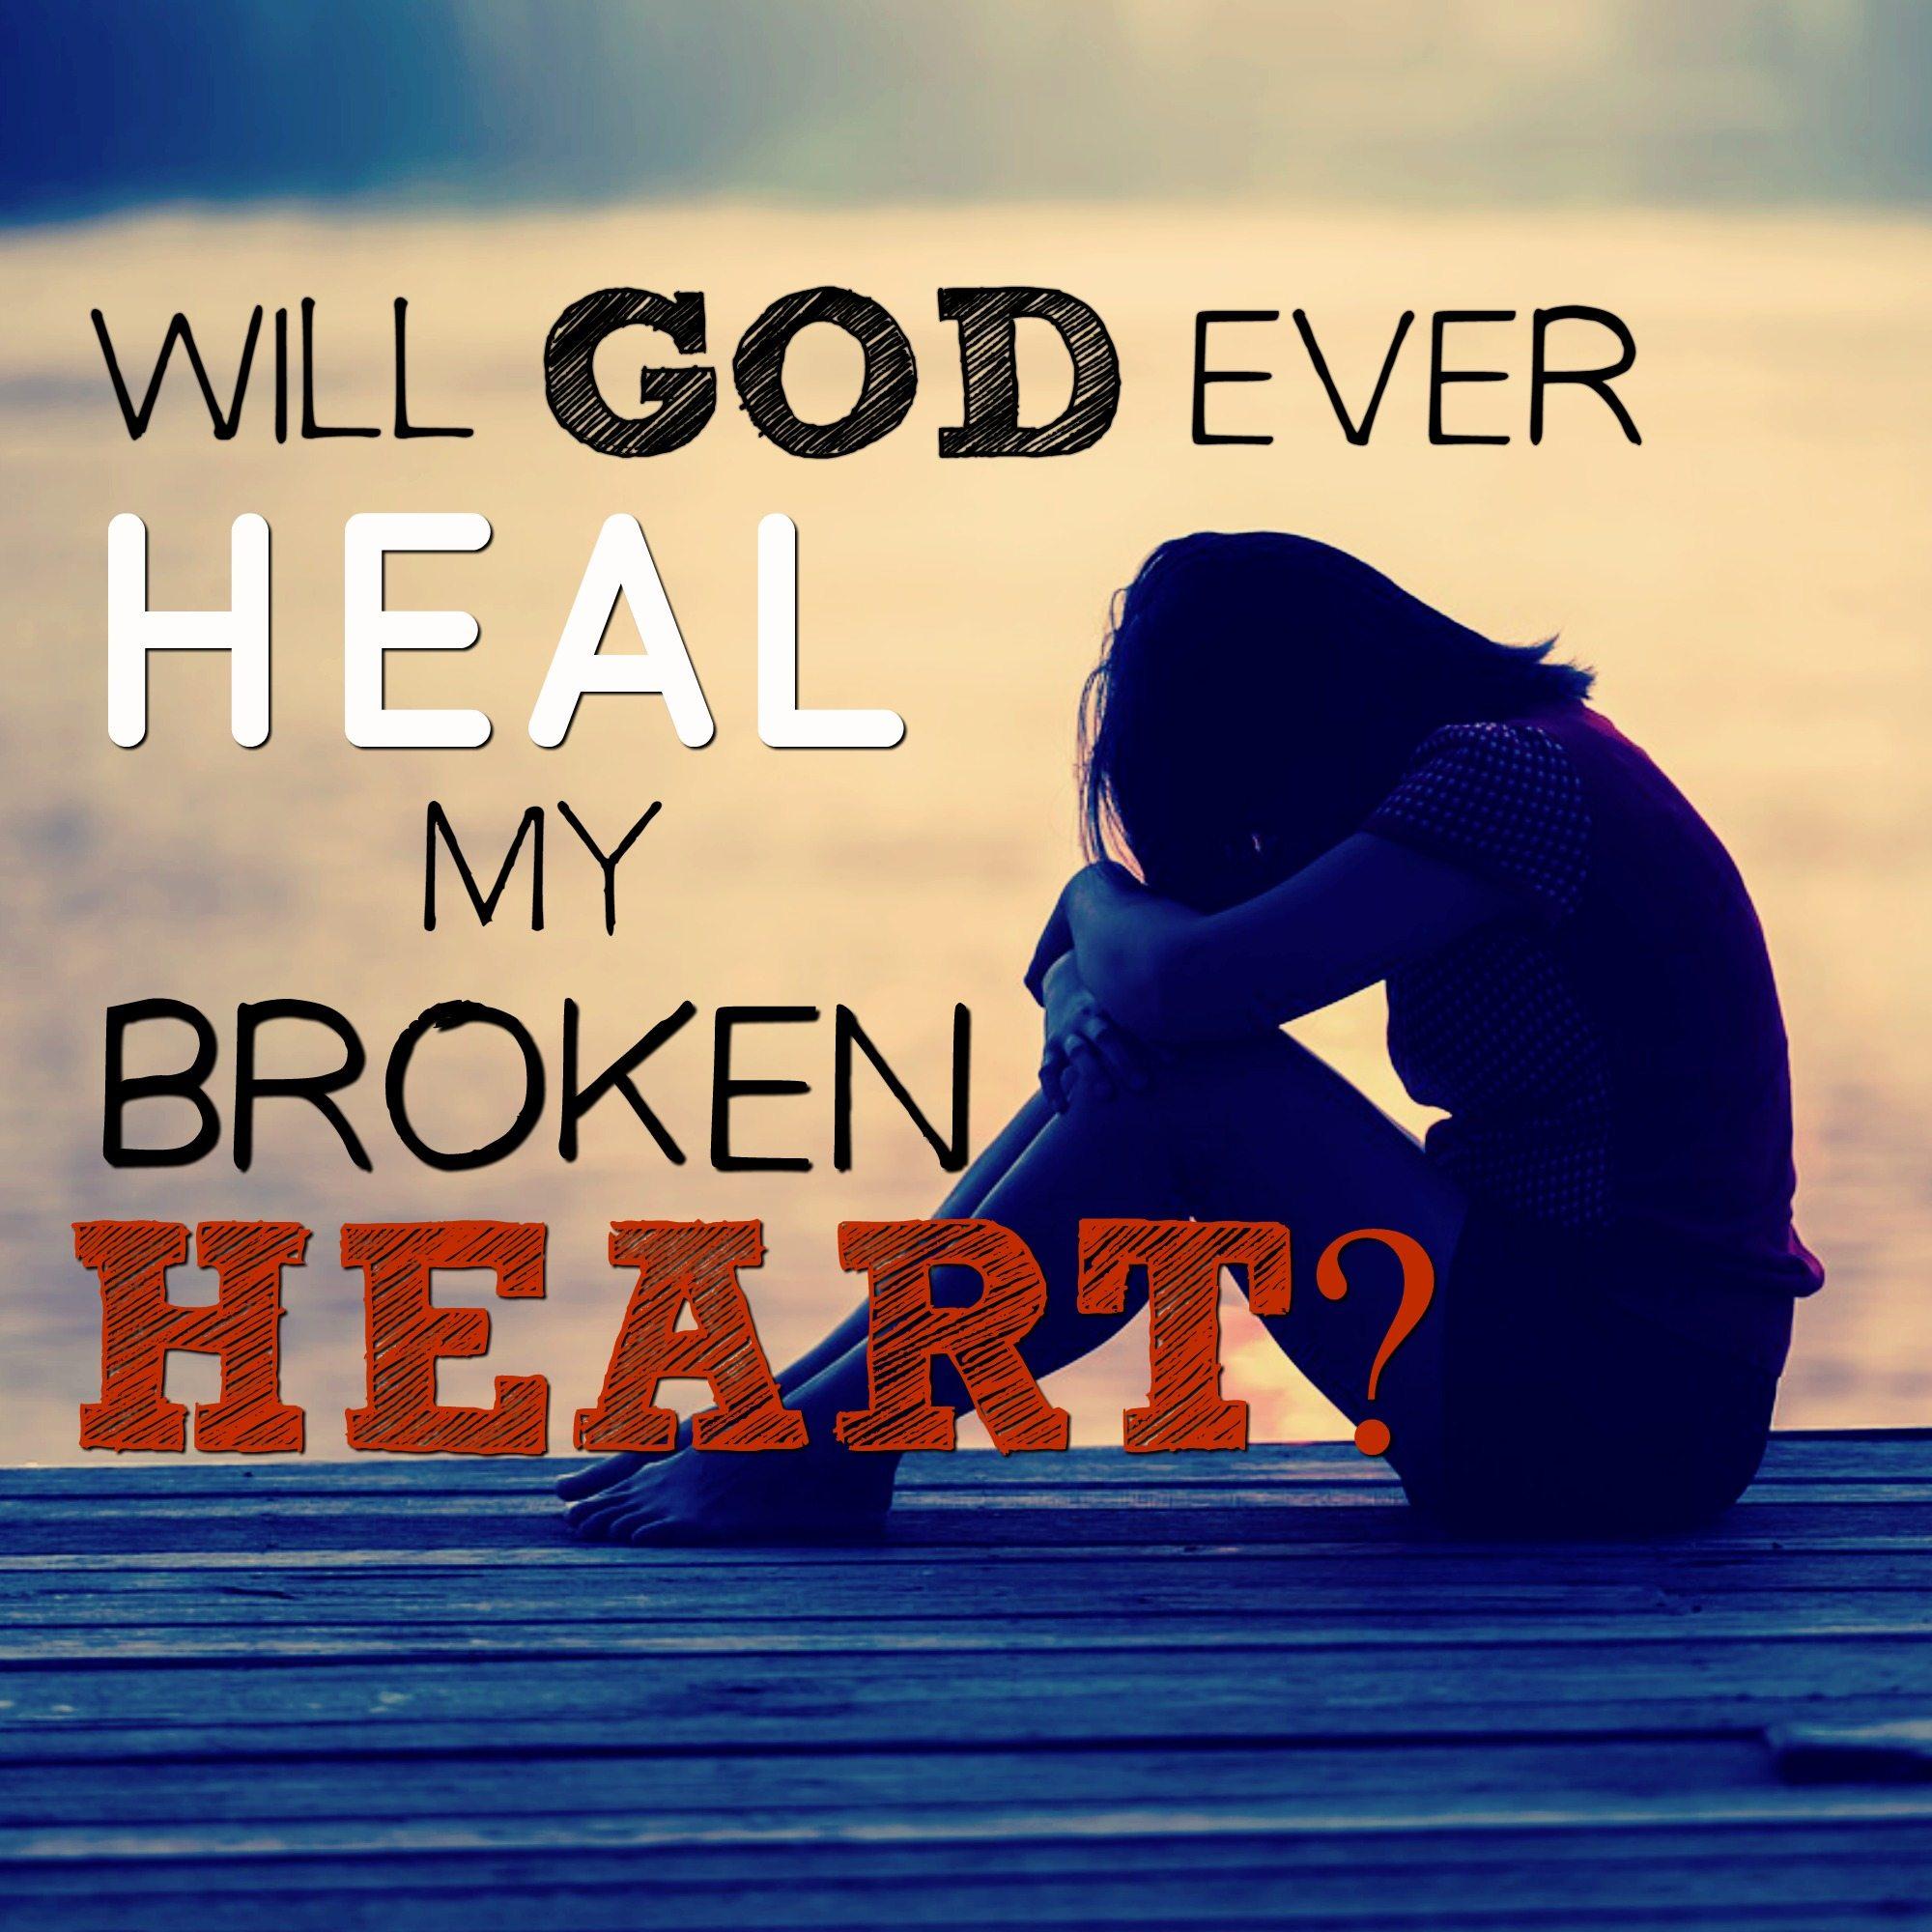 Changes that brings a broken heart